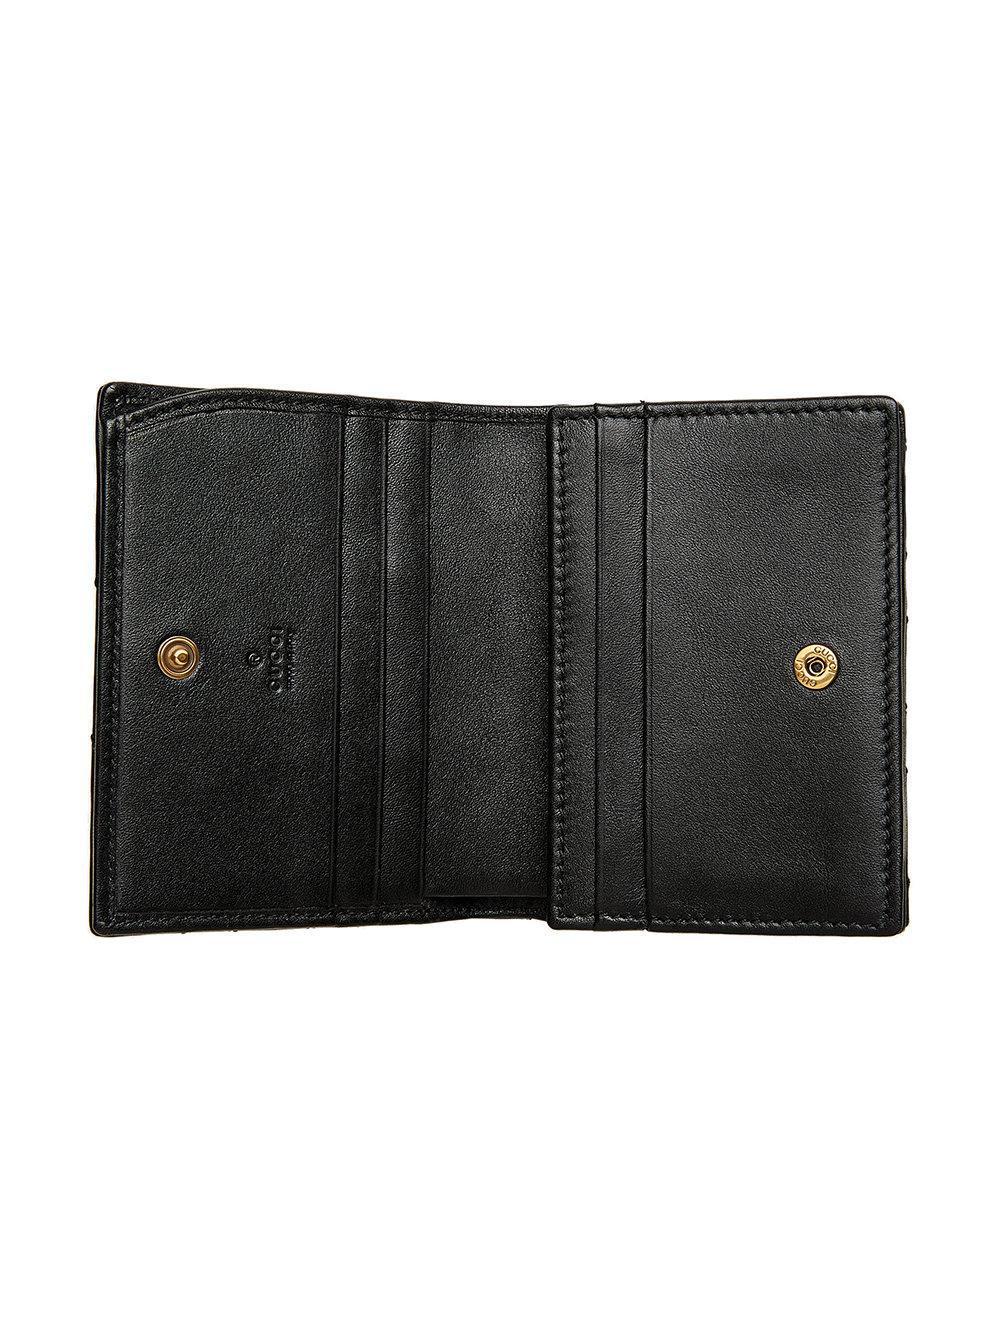 4f513710a365a4 Gucci Gg Marmont Cicada Stud Card Case in Black - Lyst